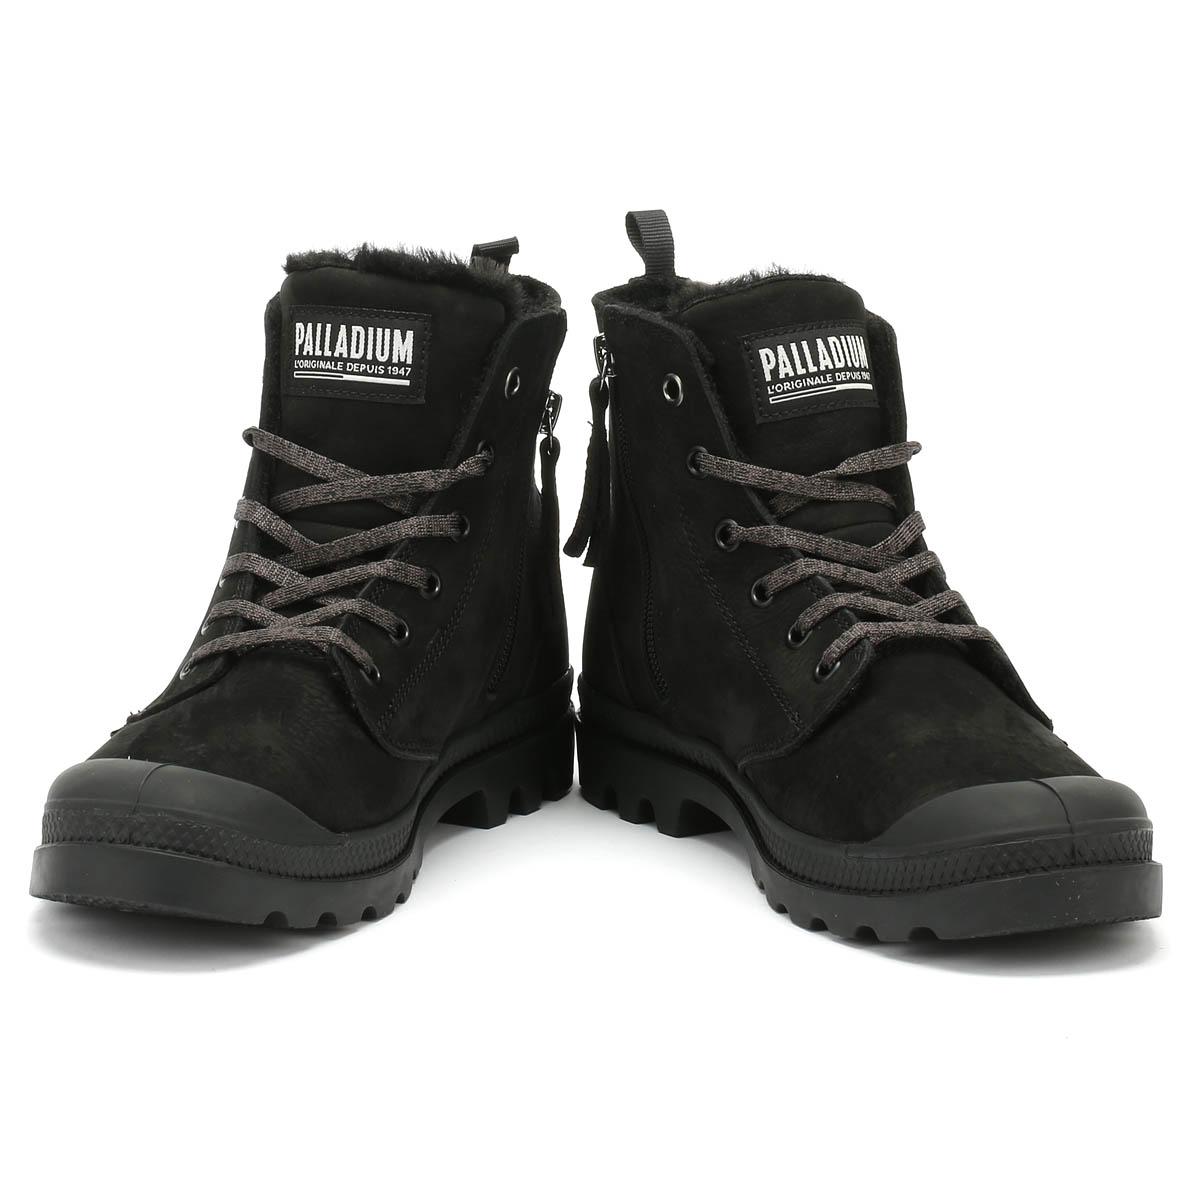 Details about Palladium Pampa Hi Zip WL Womens Boots Black Ladies Warm WInter Shoes